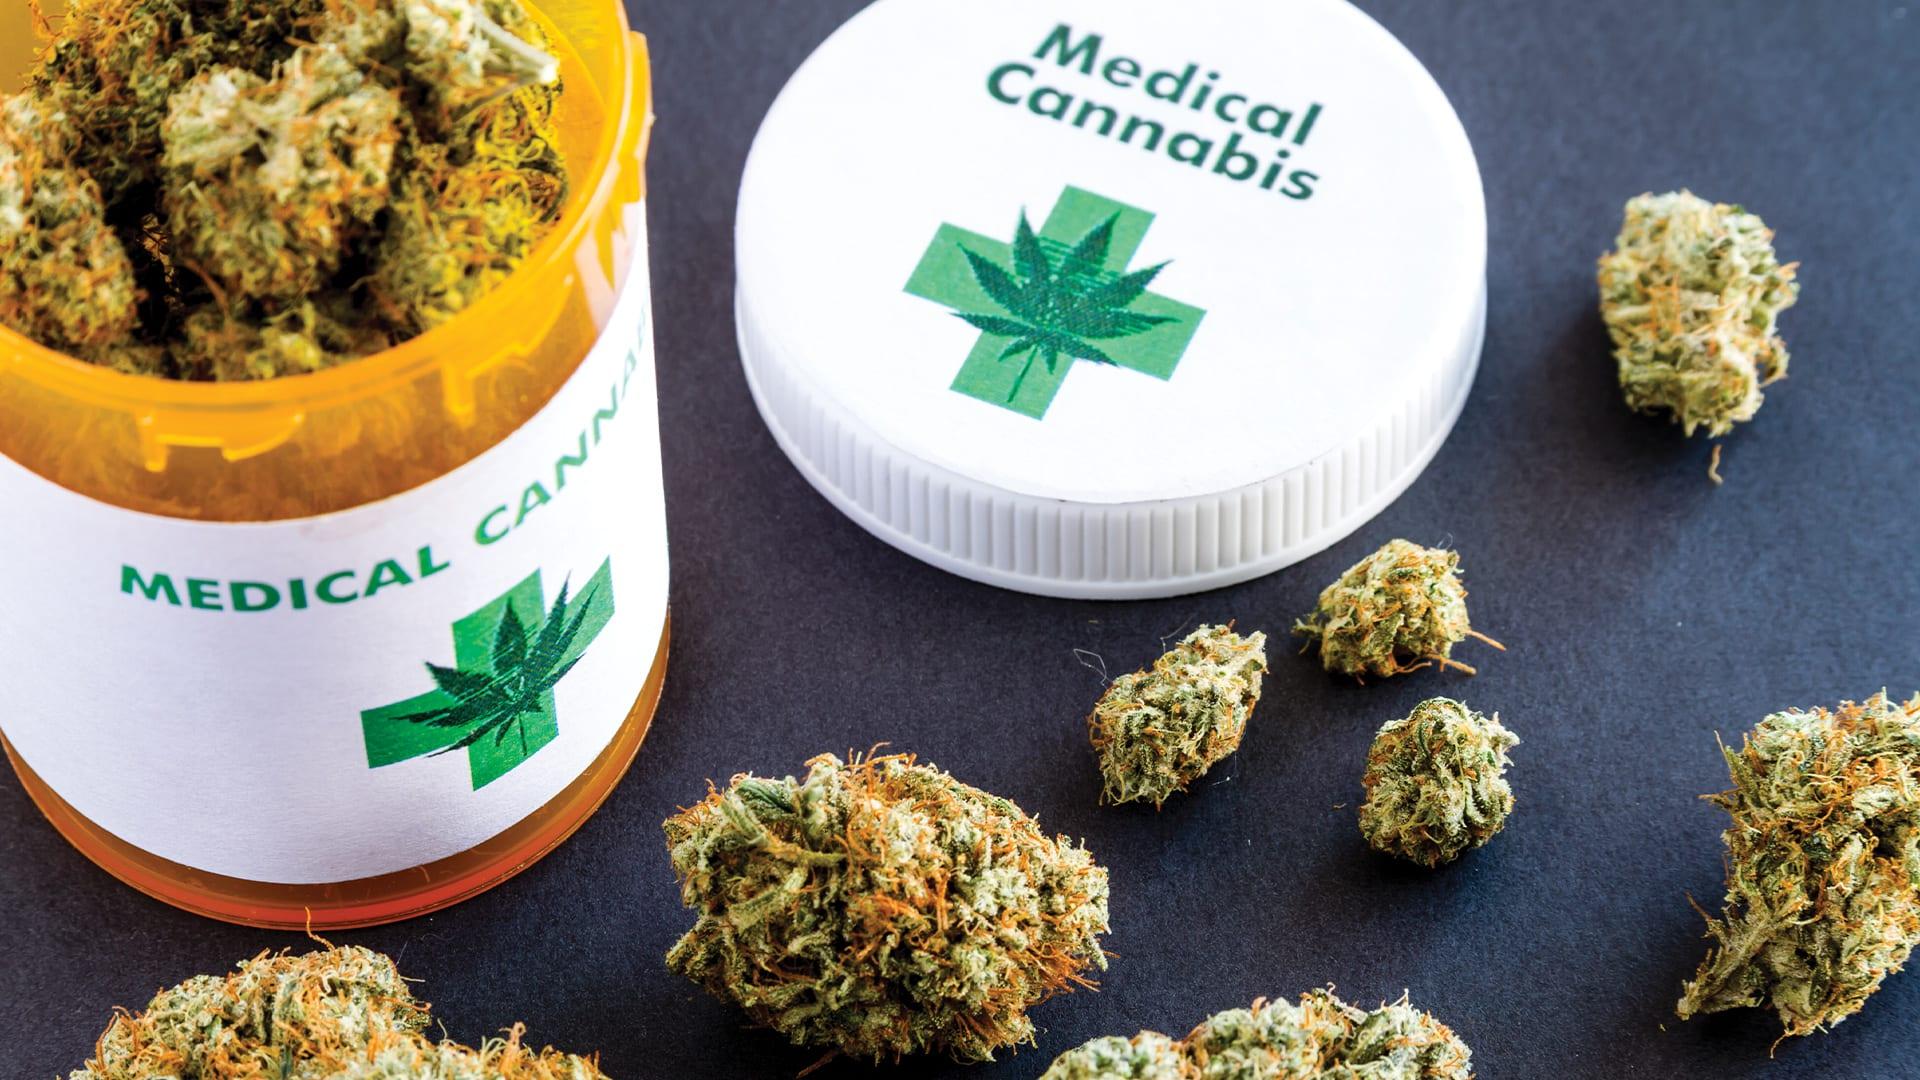 Drug abuse aggravates mental  health, expert warns